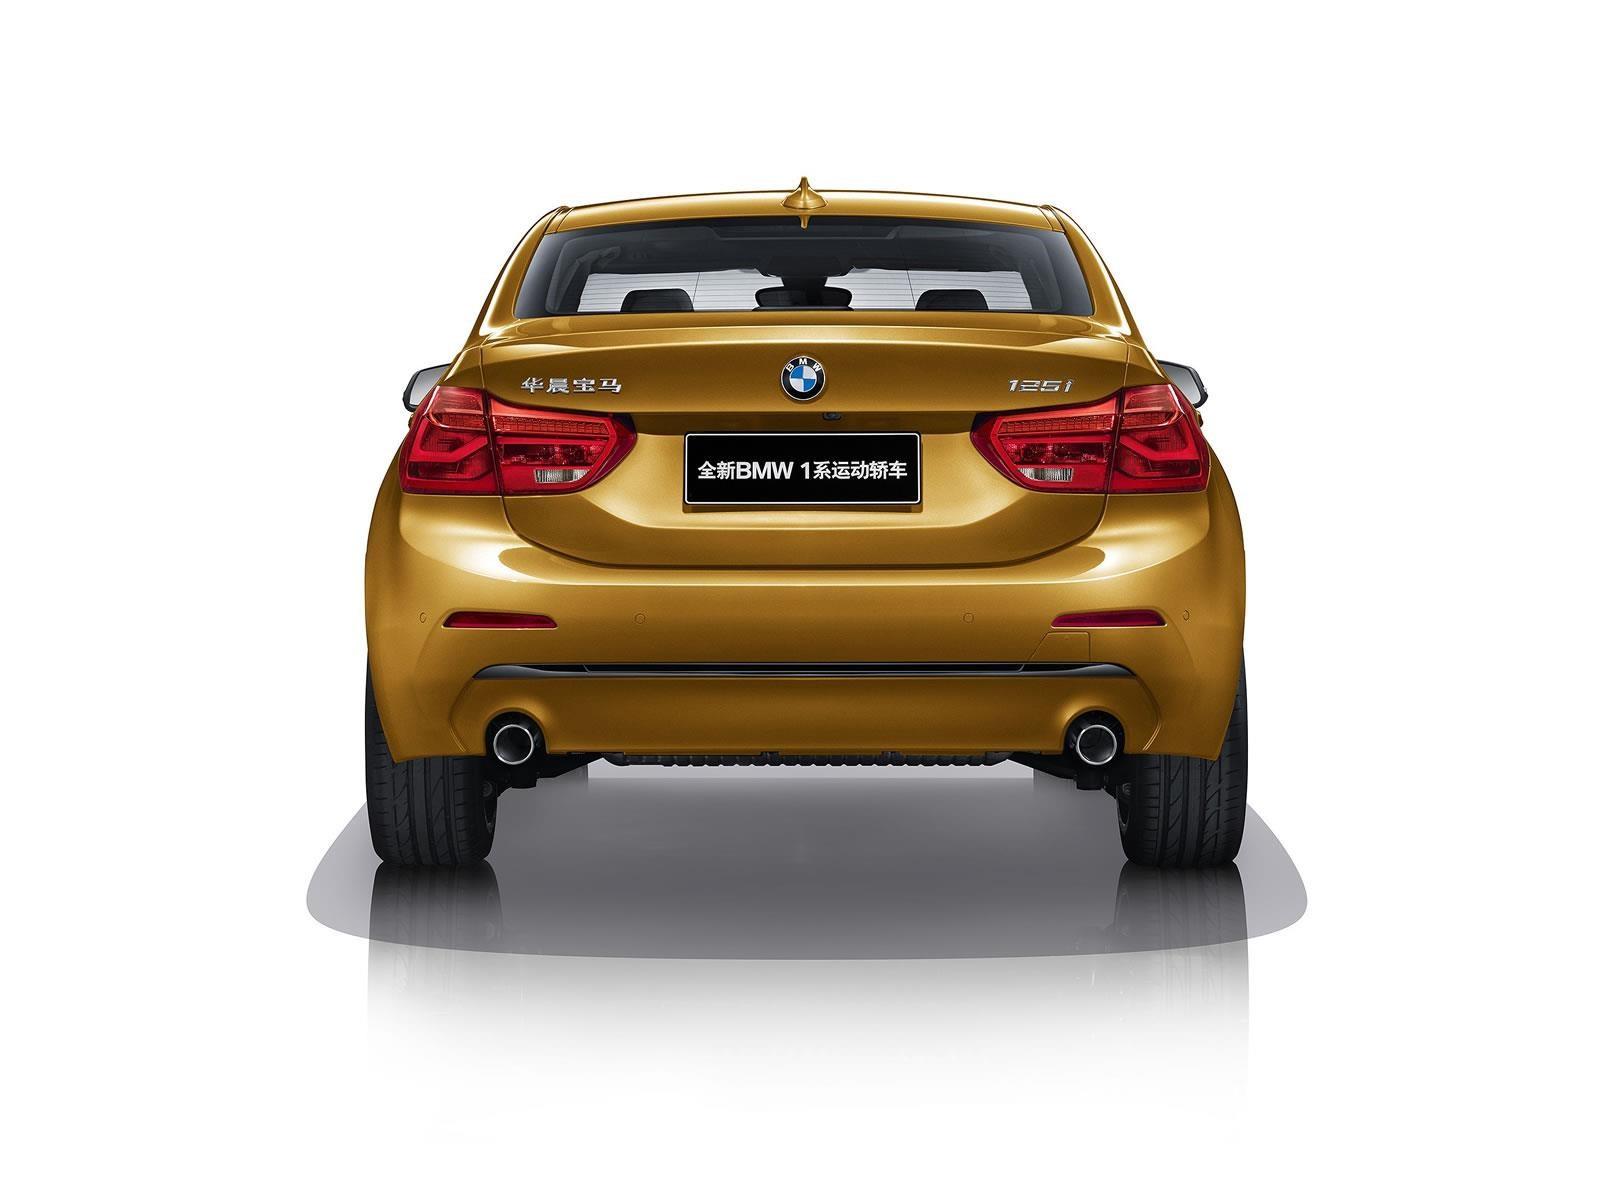 BMW Serie 1 Sedán, un compacto de tracción delantera llegaría a México